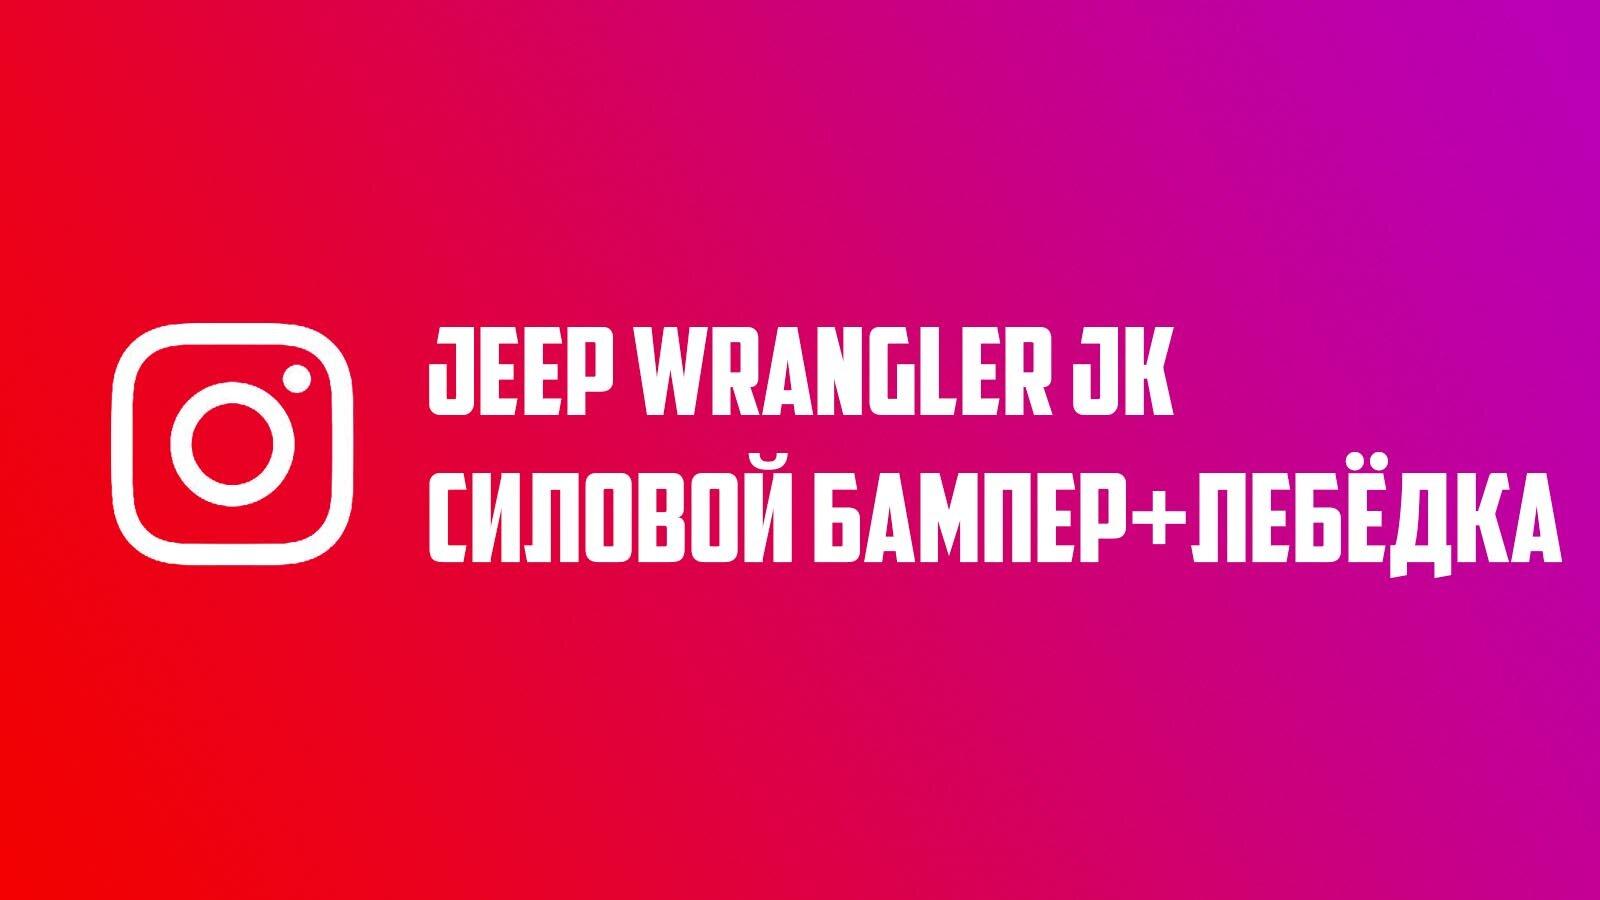 Силовой бампер Jeep Wrangler